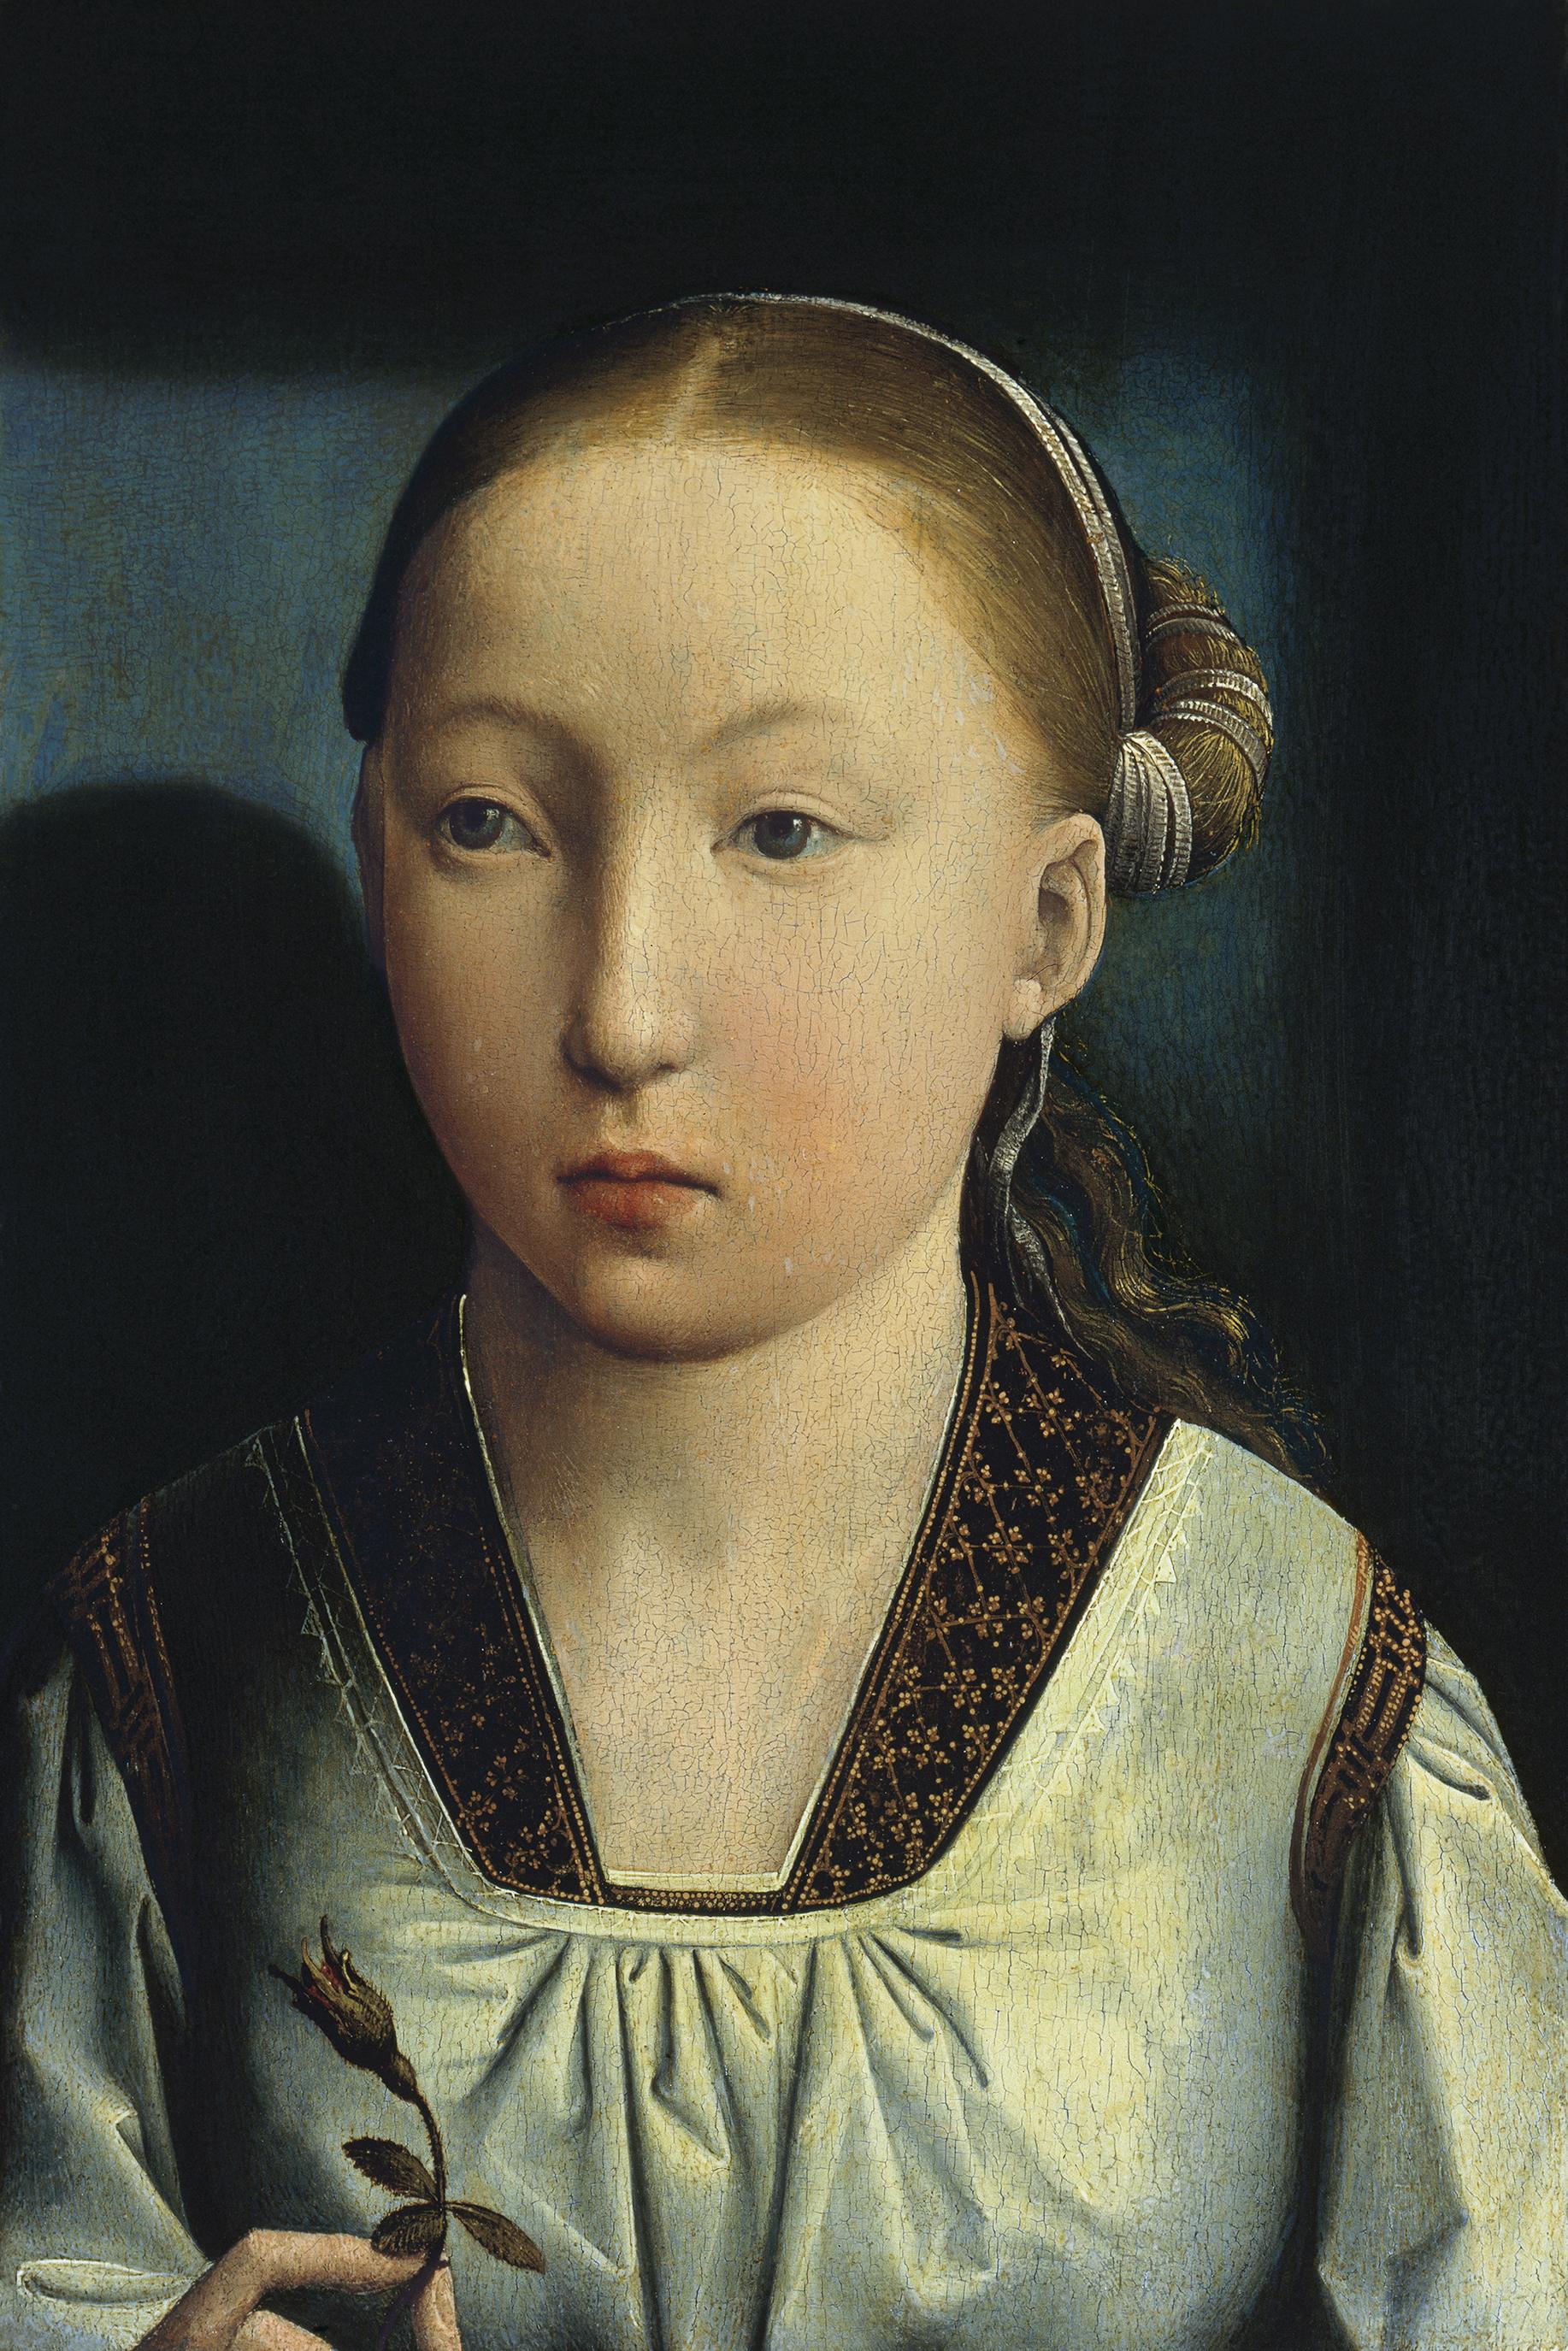 Catalina de Aragón.?¿¿ retrato de infanta. Juan de Flandes. Museo Nacional Thyssen-Bornemisza, Madrid